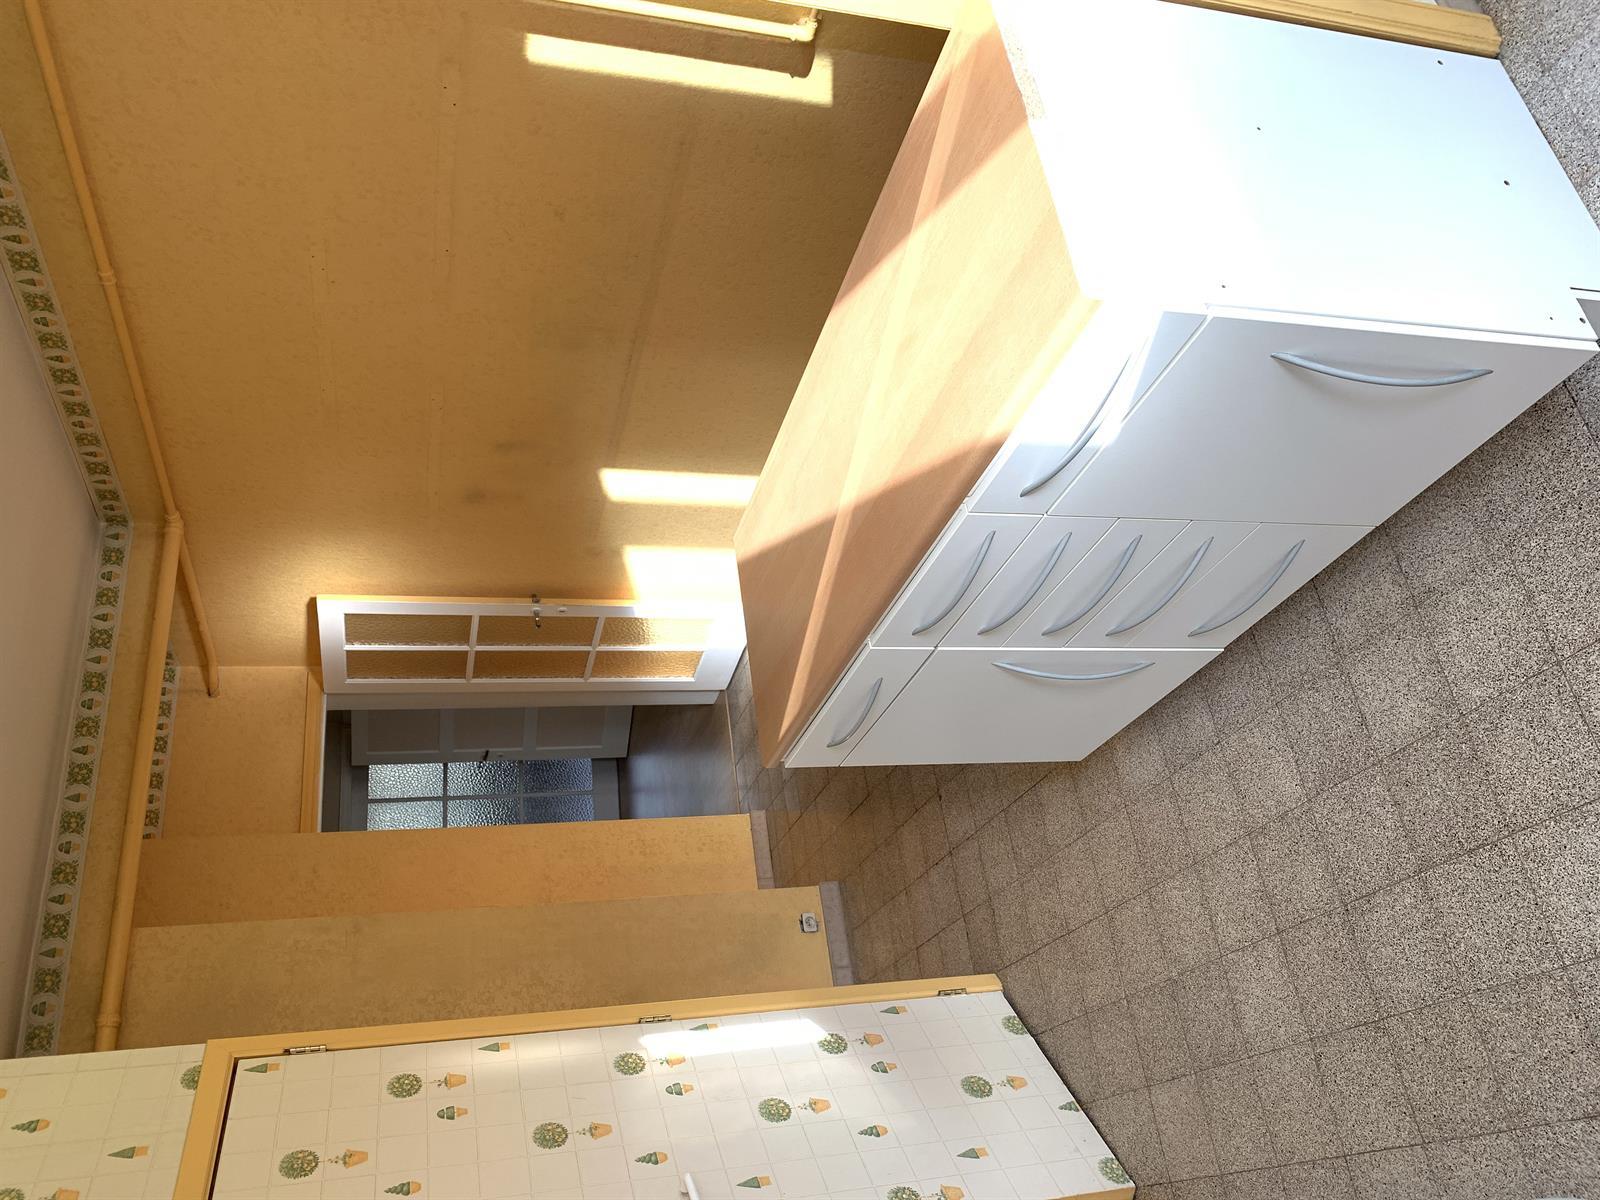 Flat - Molenbeek-Saint-Jean - #3956375-19